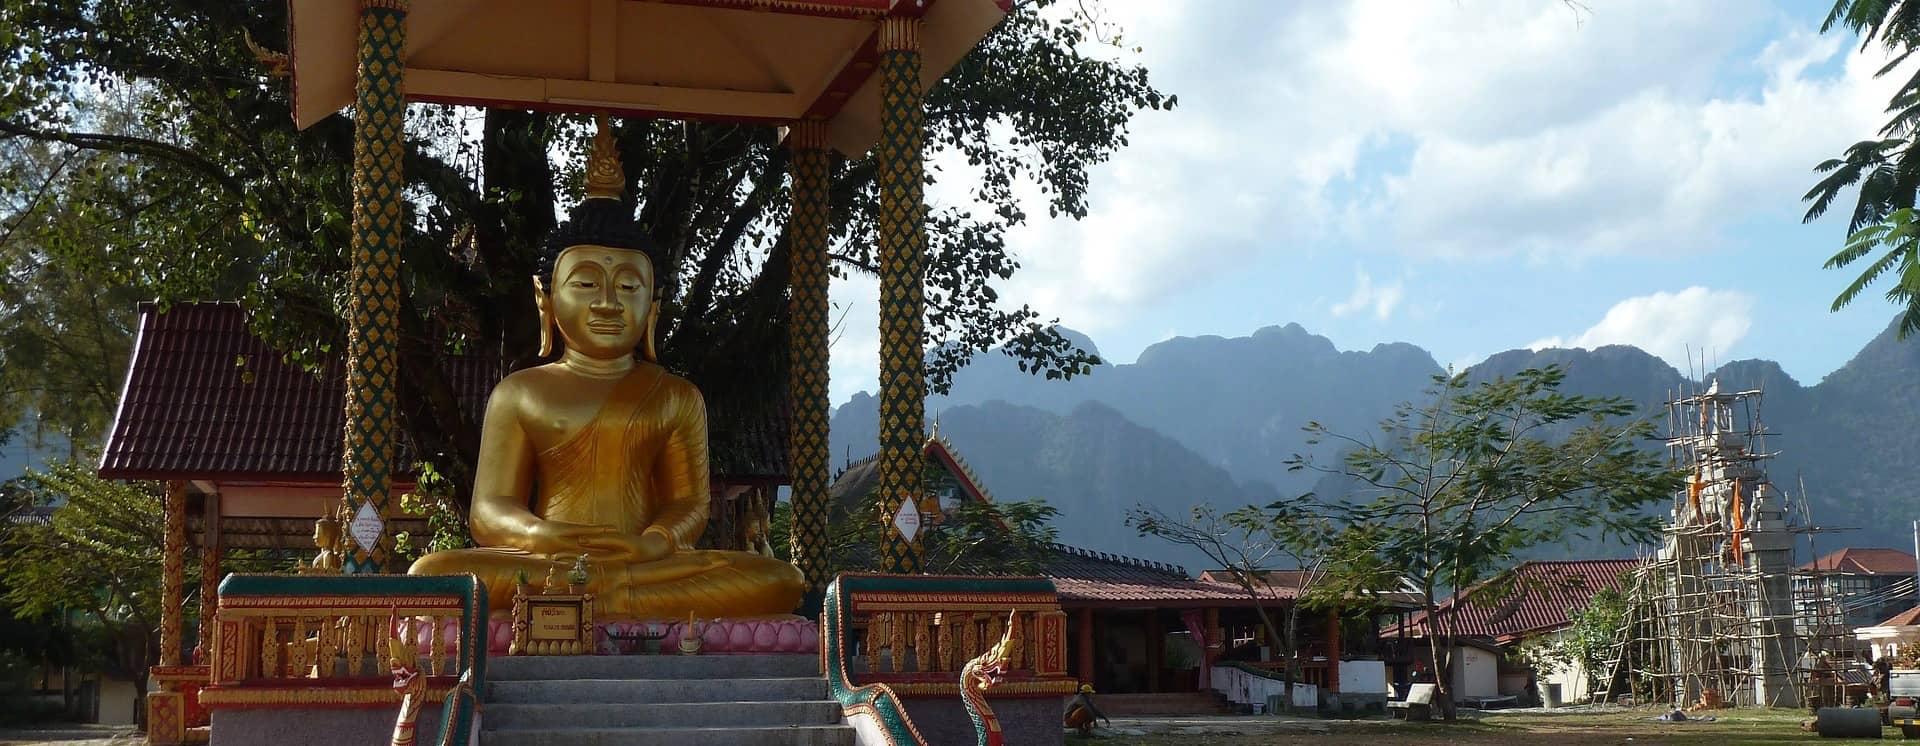 A Buddha statue in Vang Vieng